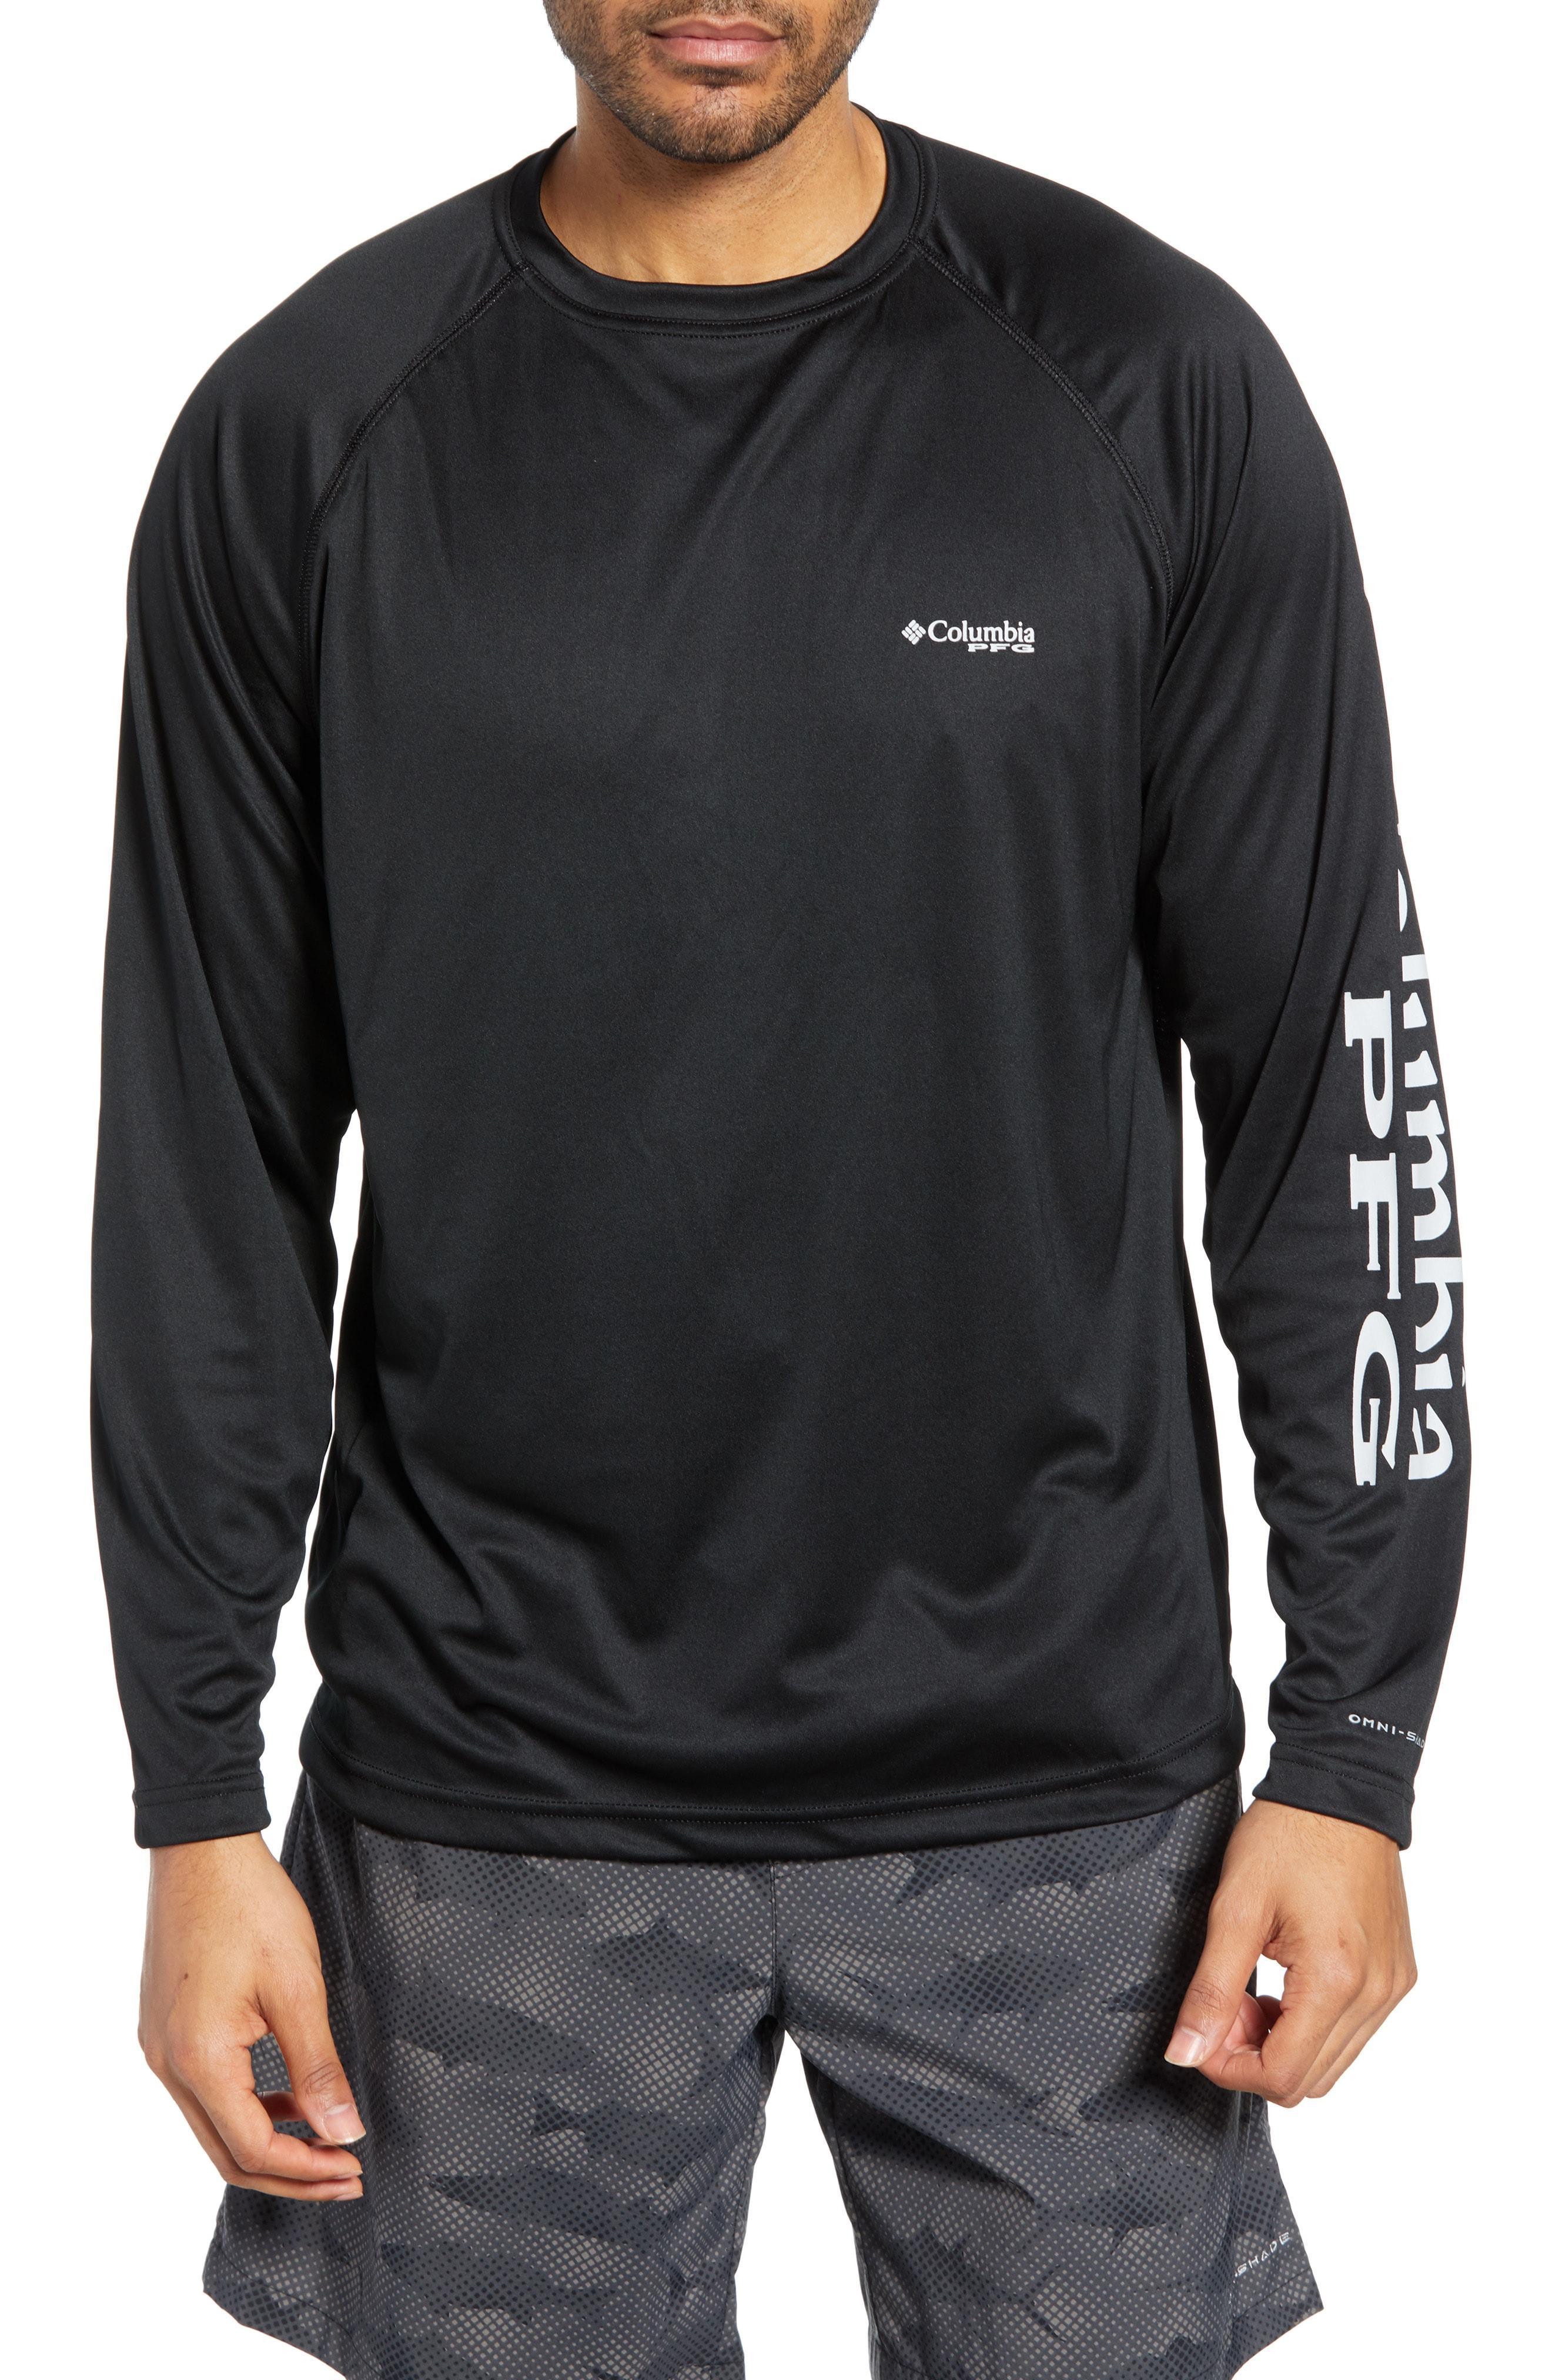 7c5afe38aa4 Columbia - Gray Pfg Terminal Tackle Performance Long Sleeve T-shirt for Men  - Lyst. View fullscreen